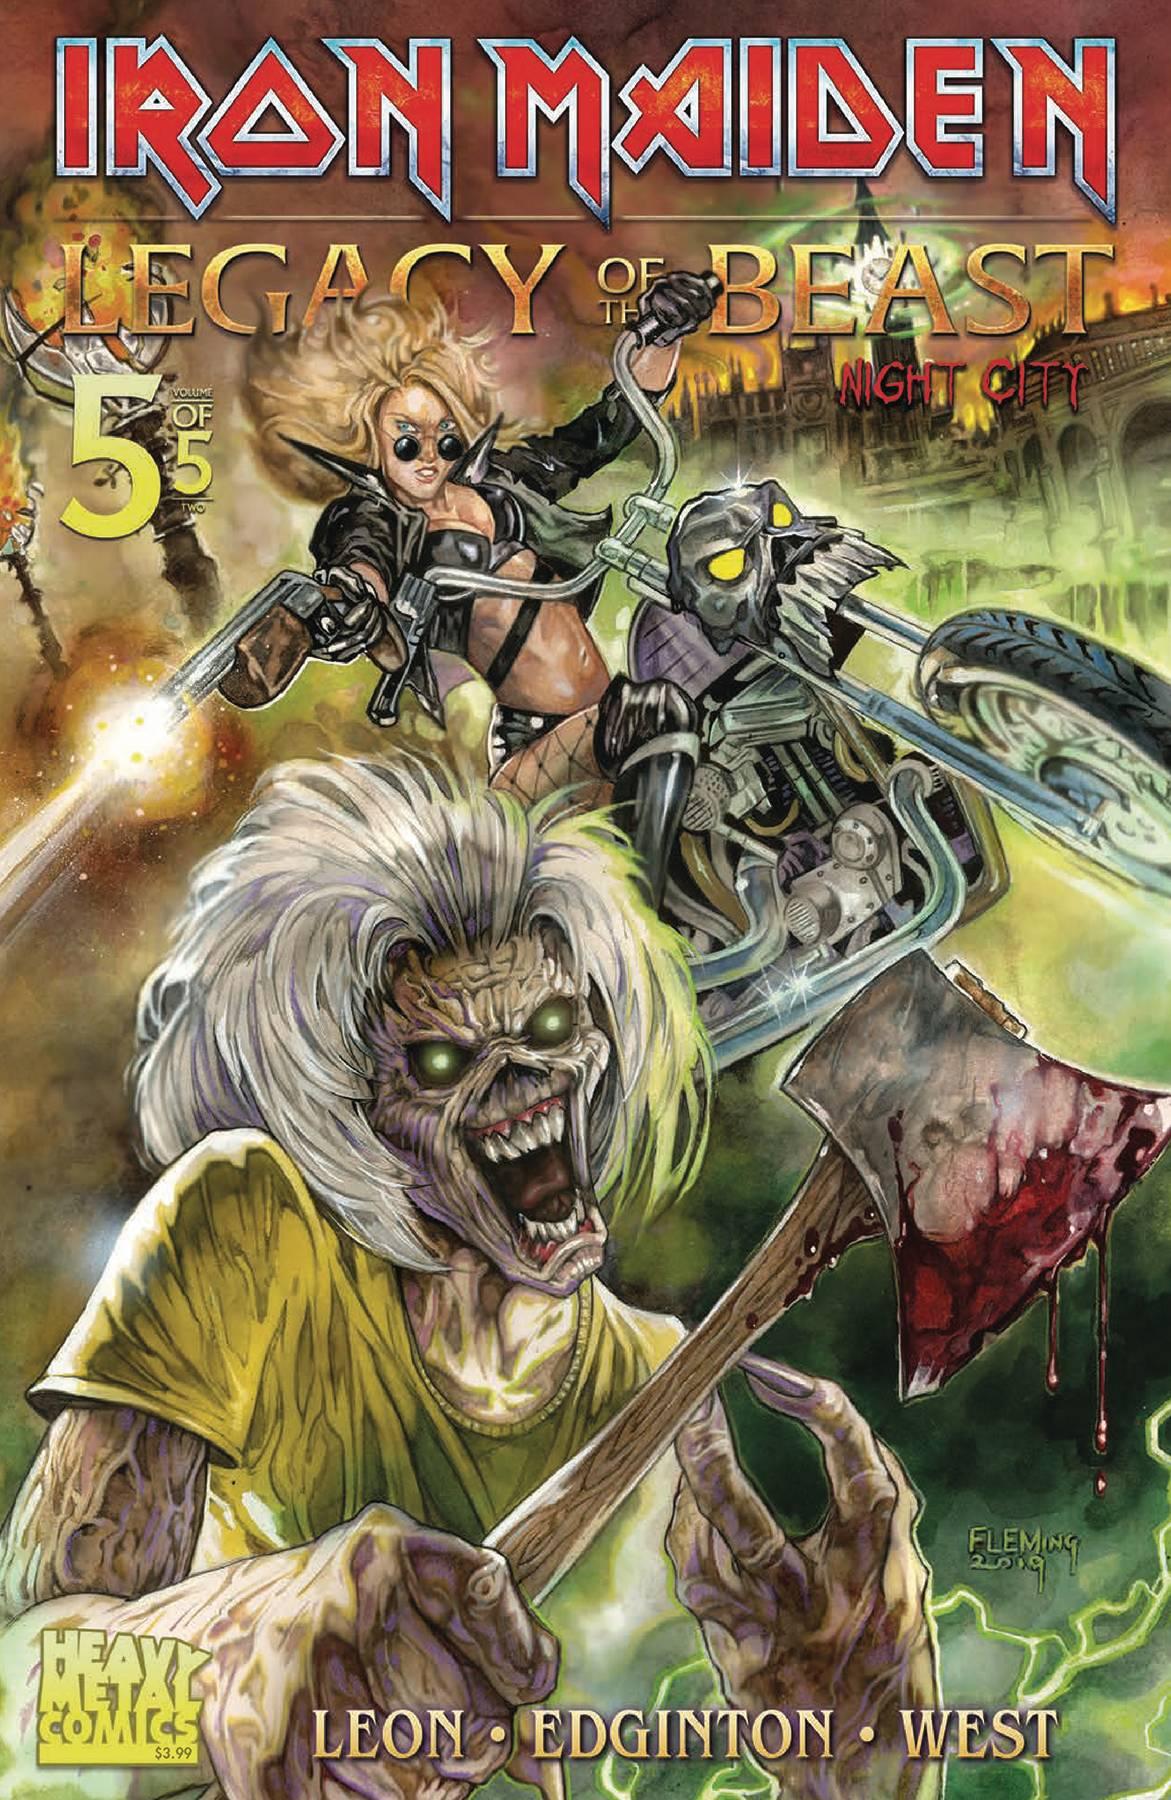 Iron Maiden: Legacy of the Beast Vol 2 - Night City #5 (2021)